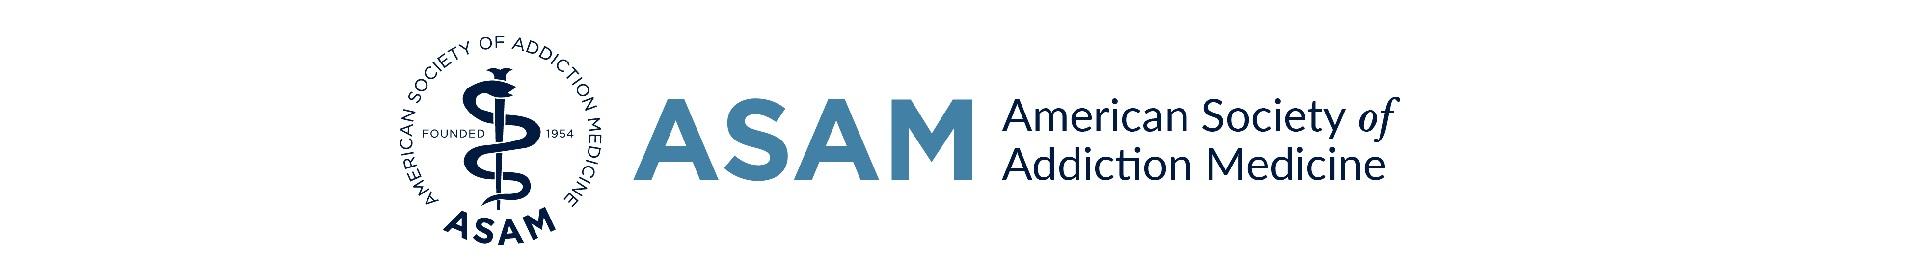 ASAM Faculty Application Portal Event Banner